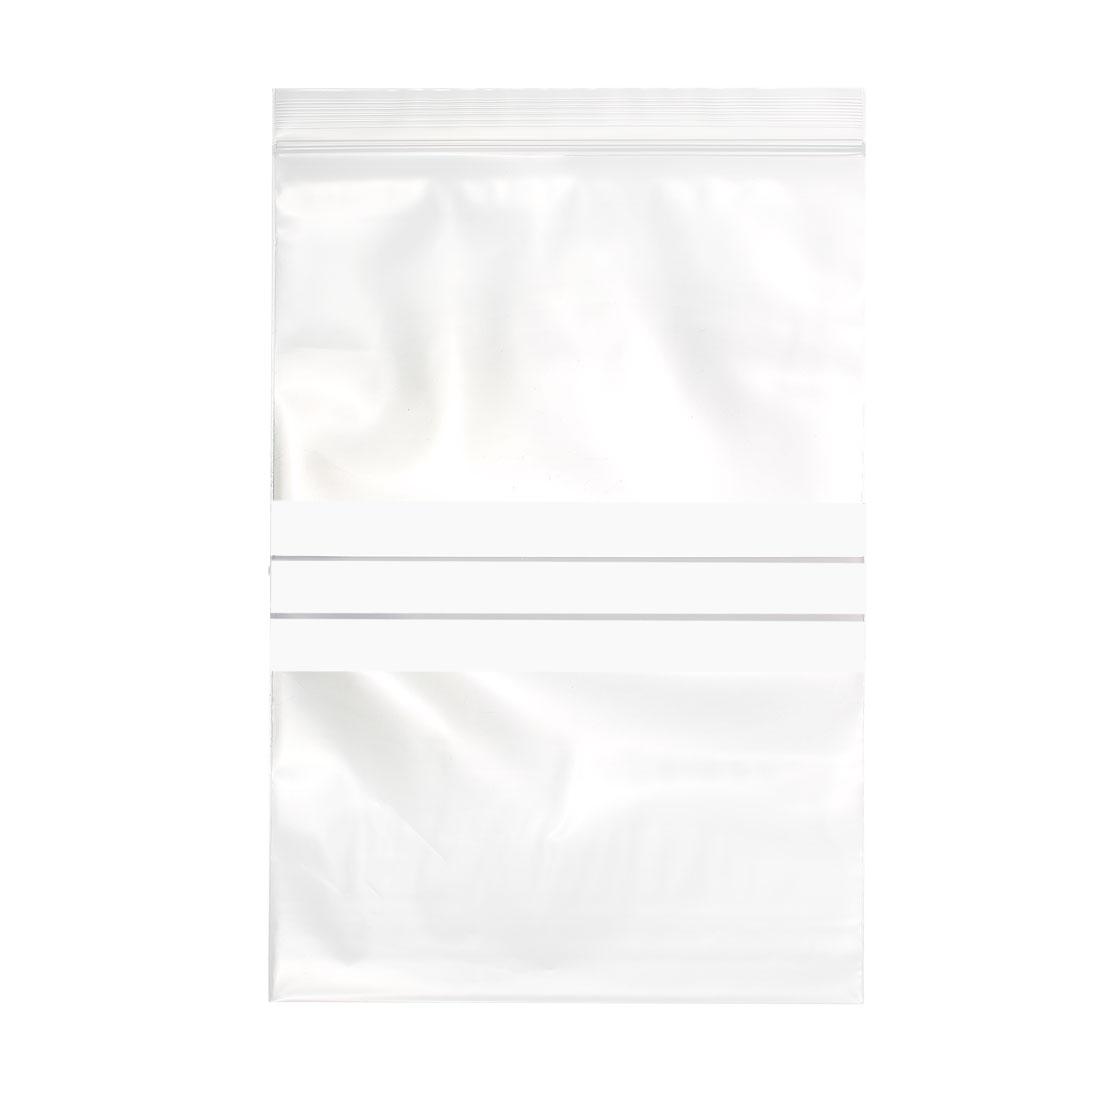 "50 Pcs Zip Lock Plastic Bags Writable Reclosable Disposable Clear 8.5""X6"" 8 MIL"